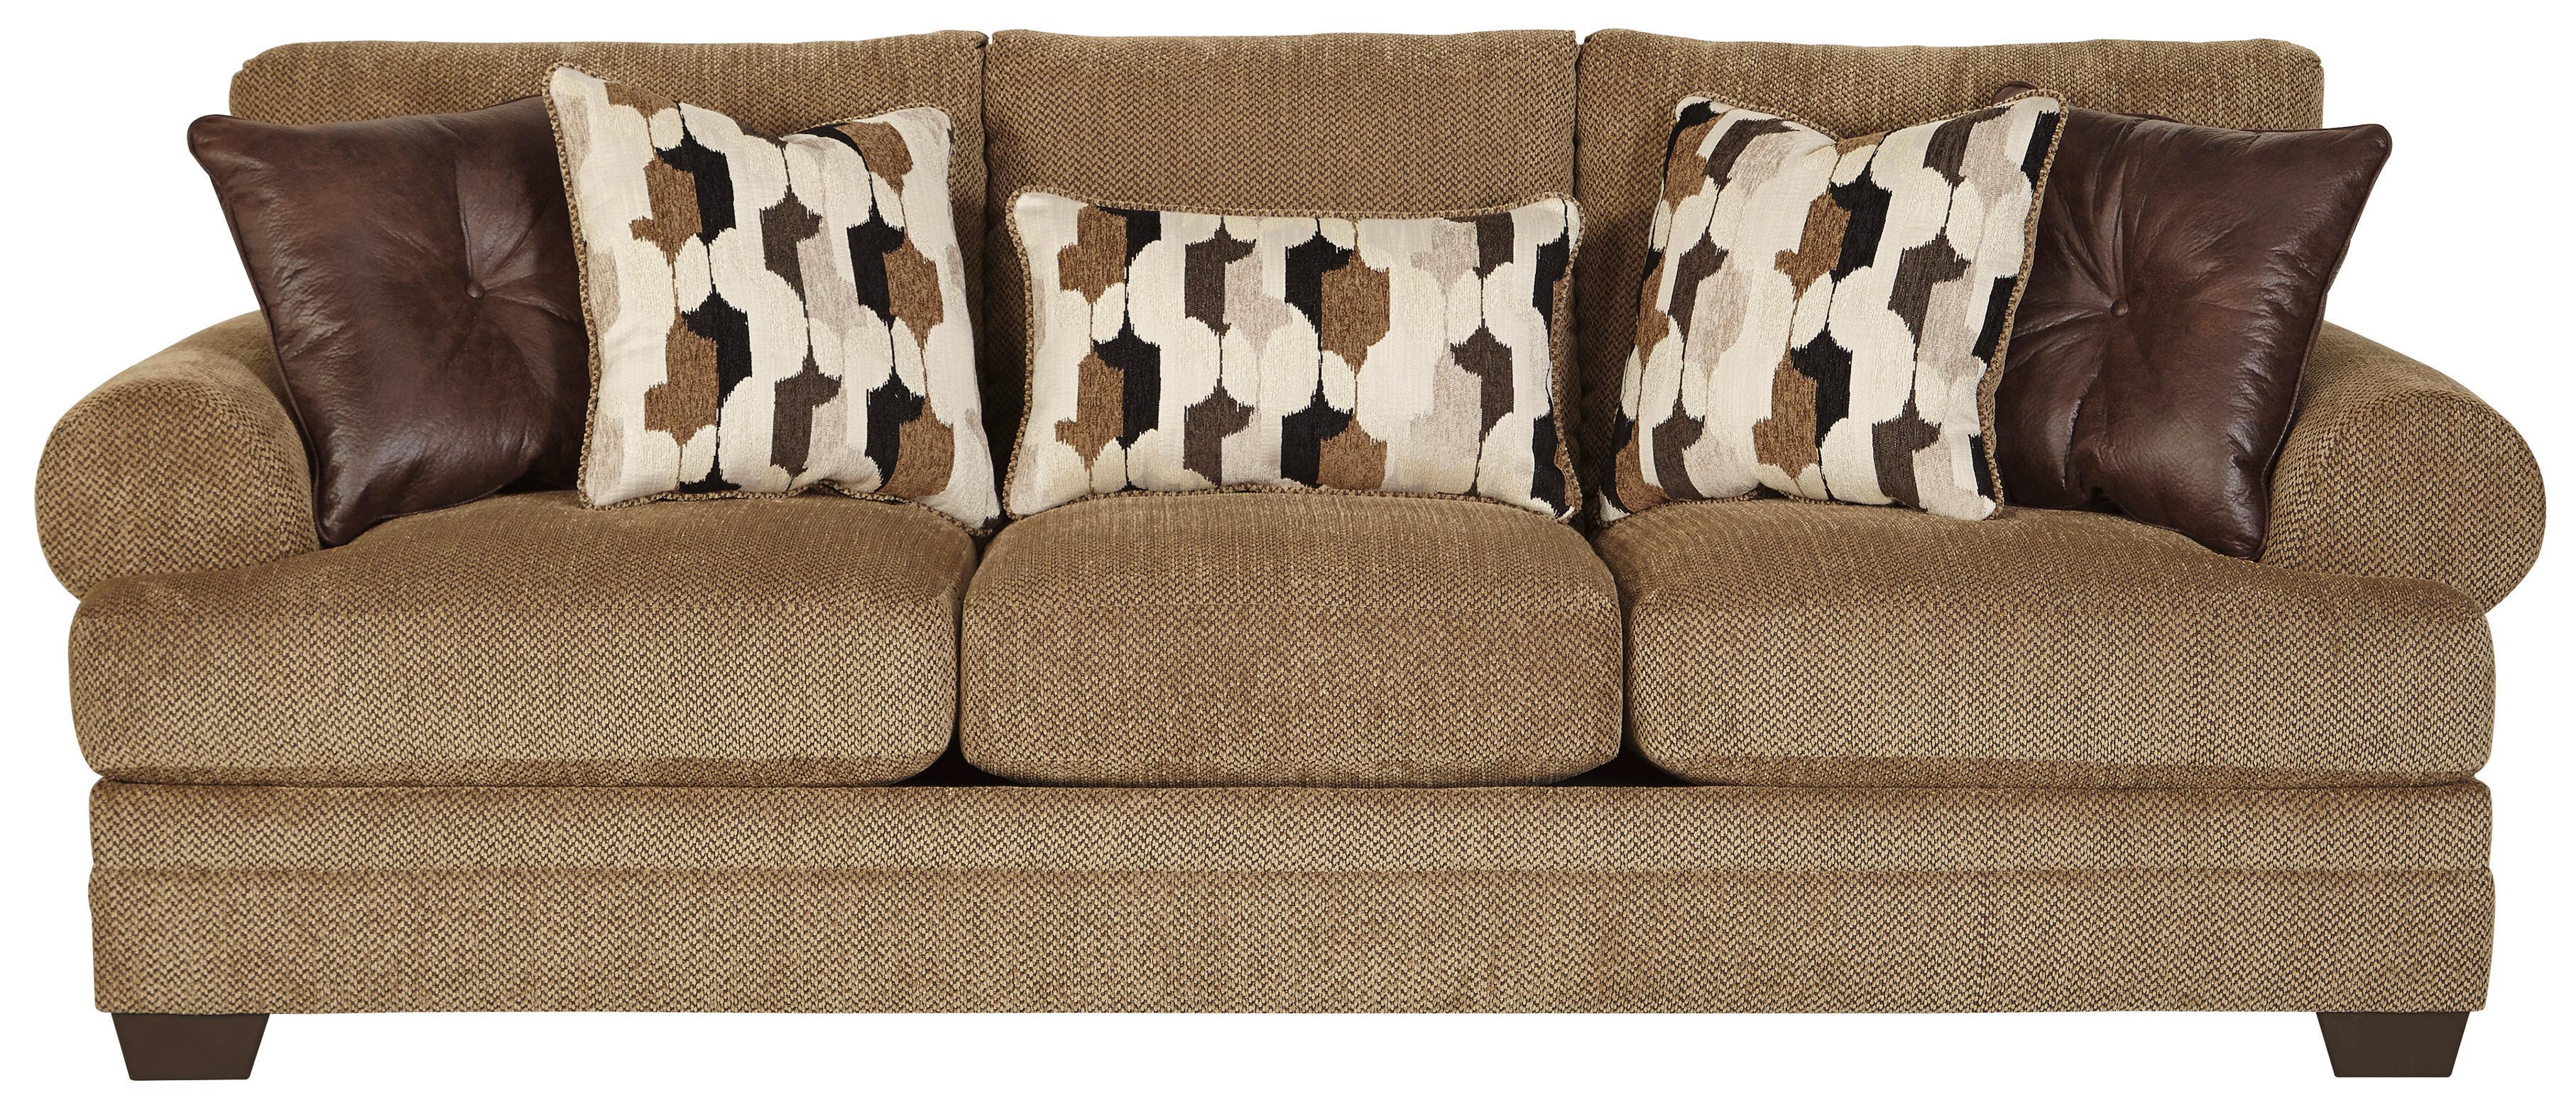 Signature Design by Ashley Kelemen - Amber Queen Sofa Sleeper - Item Number: 4710039